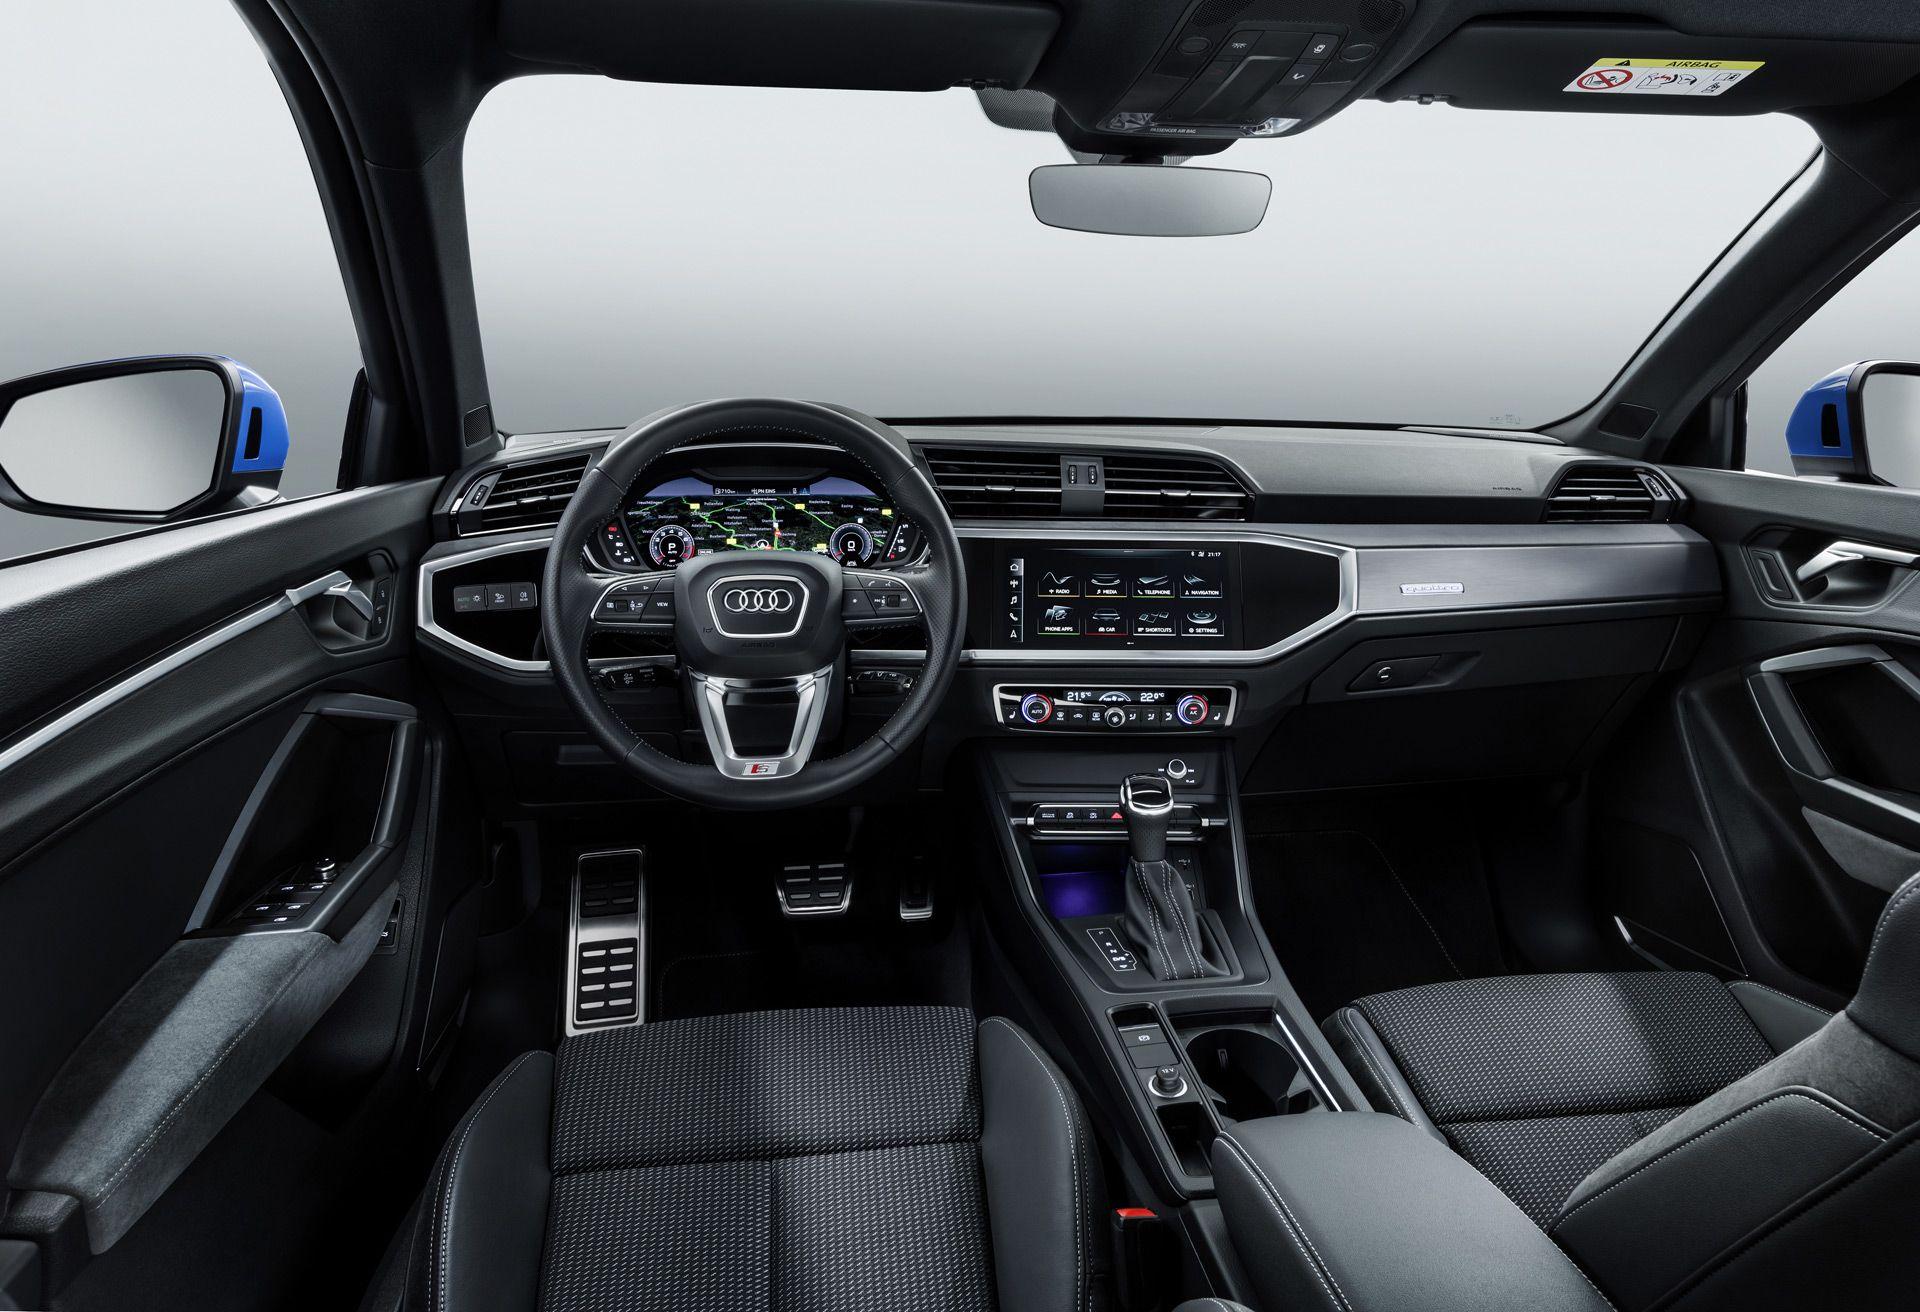 2019 Audi Q3 Preview In 2020 Audi Q3 Audi Q7 Hybrid Audi